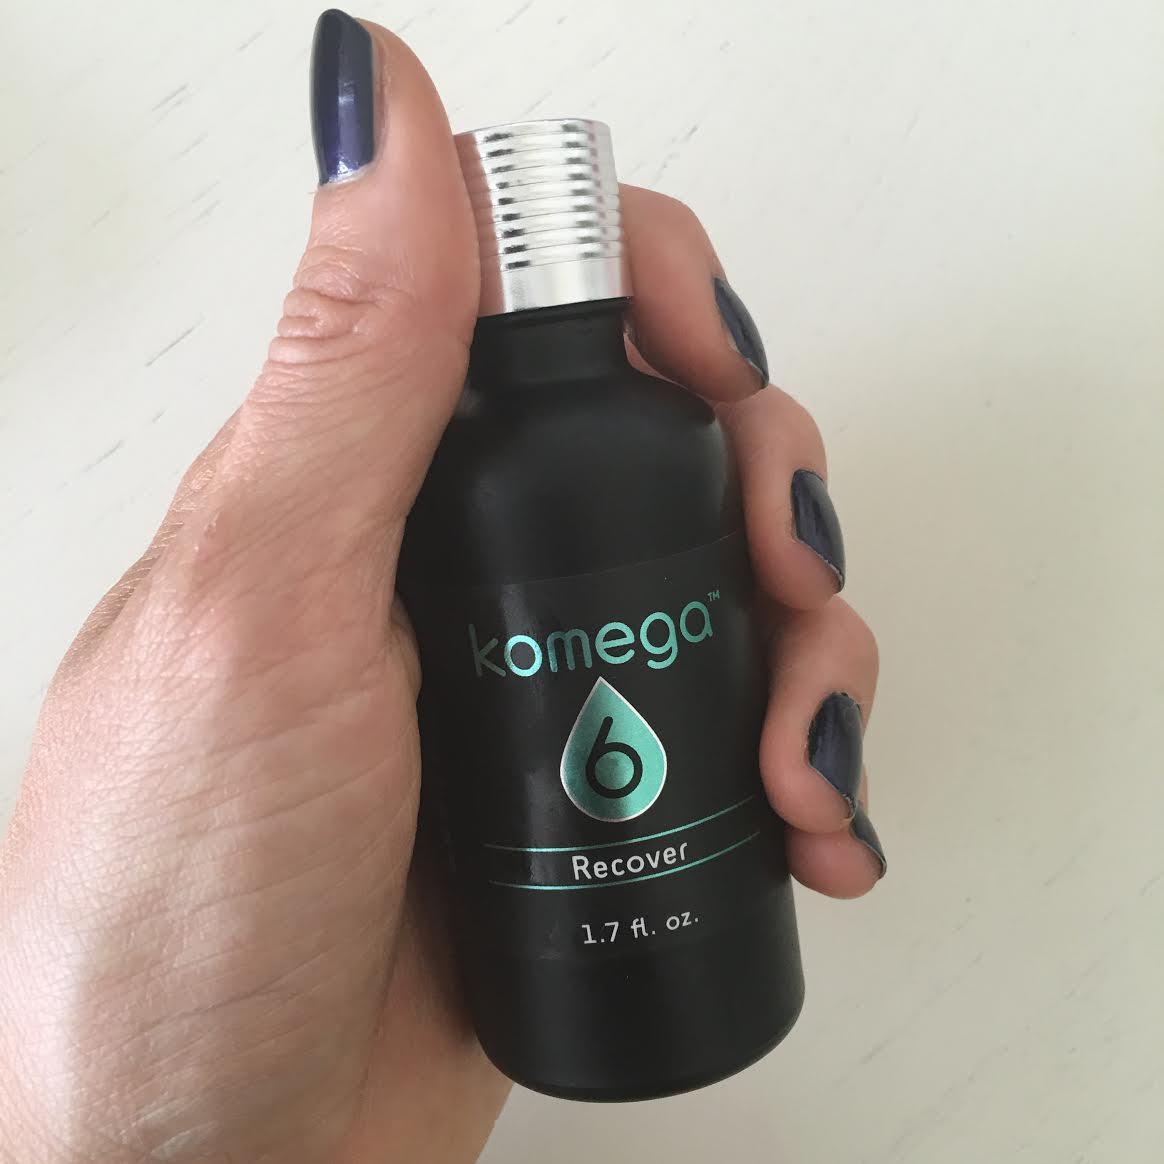 Komega Recovery oil